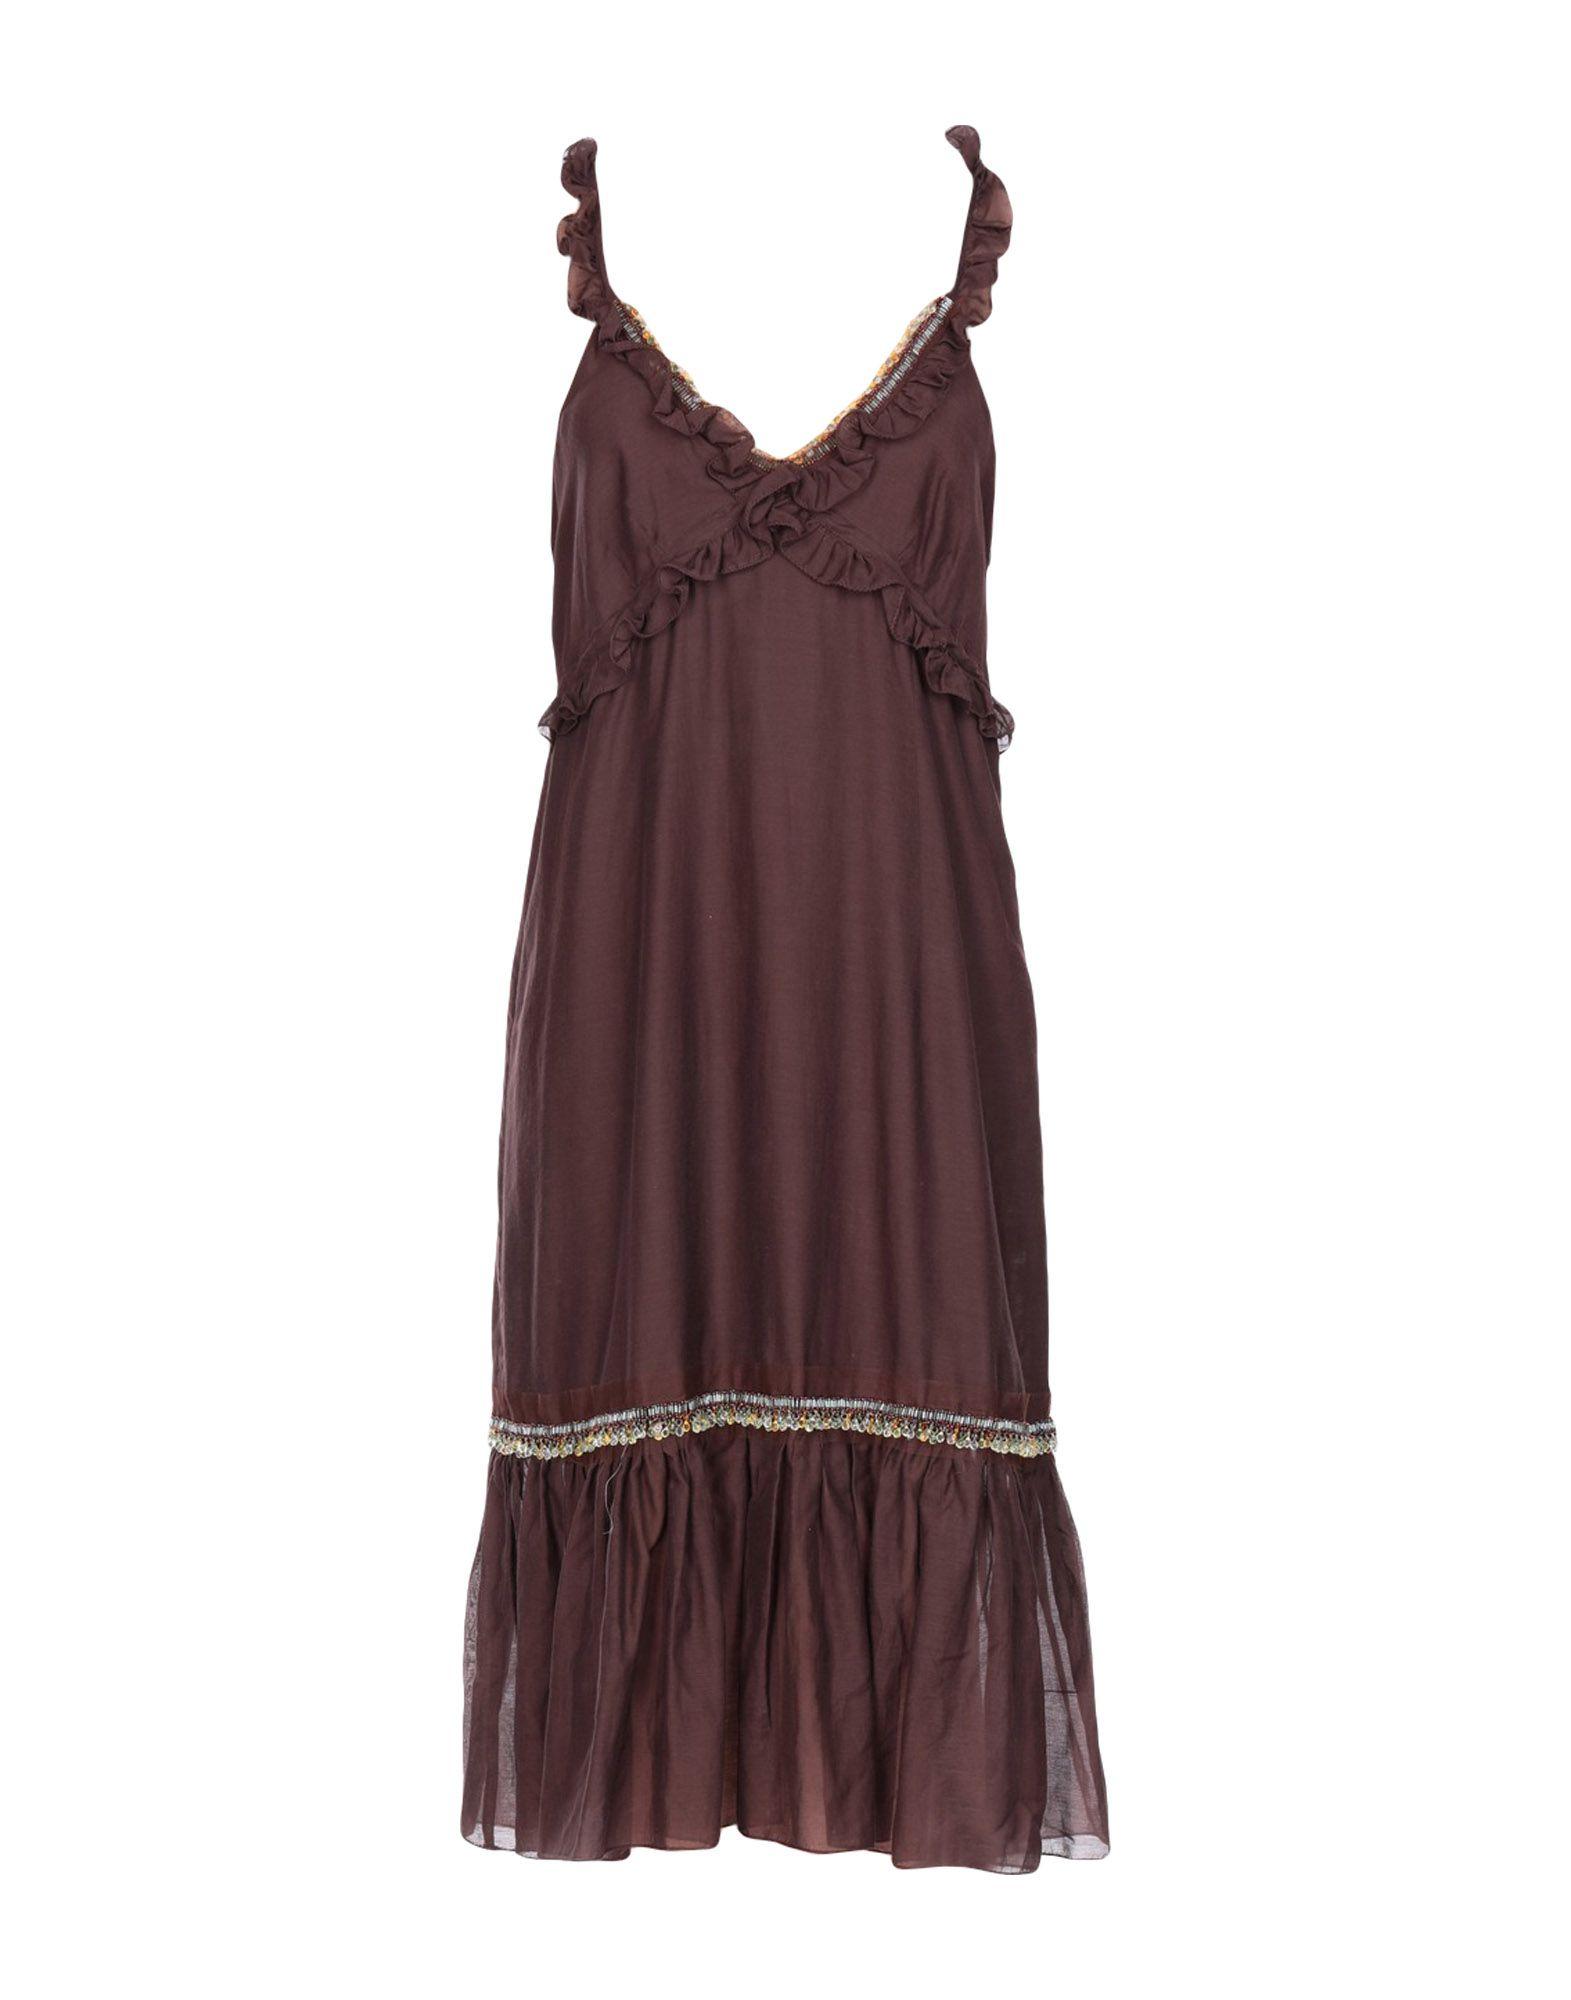 NR NICOLETTA RUGGIERO Платье длиной 3/4 to4rooms лампа потолочная ruggiero page 3